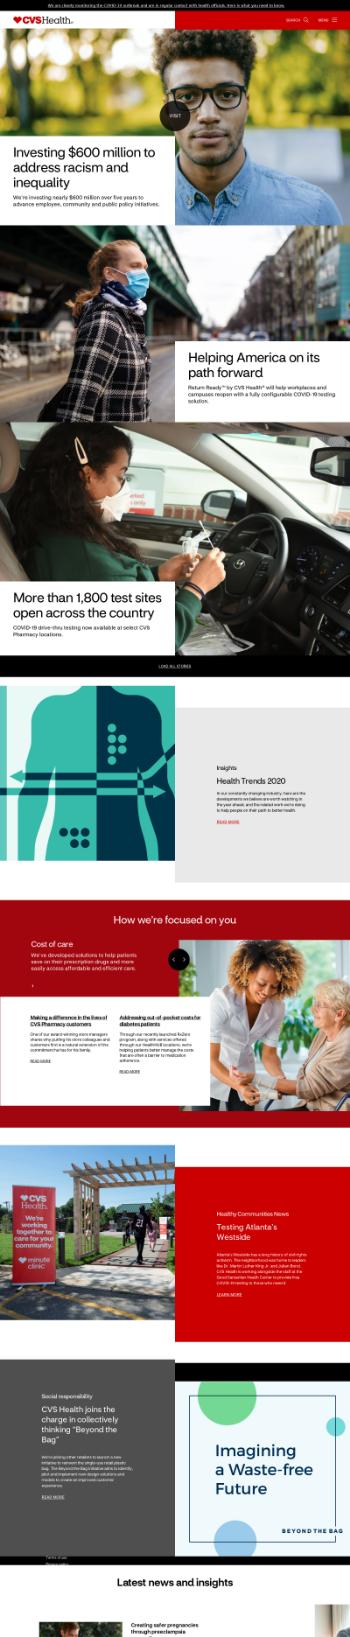 CVS Health Corporation Website Screenshot